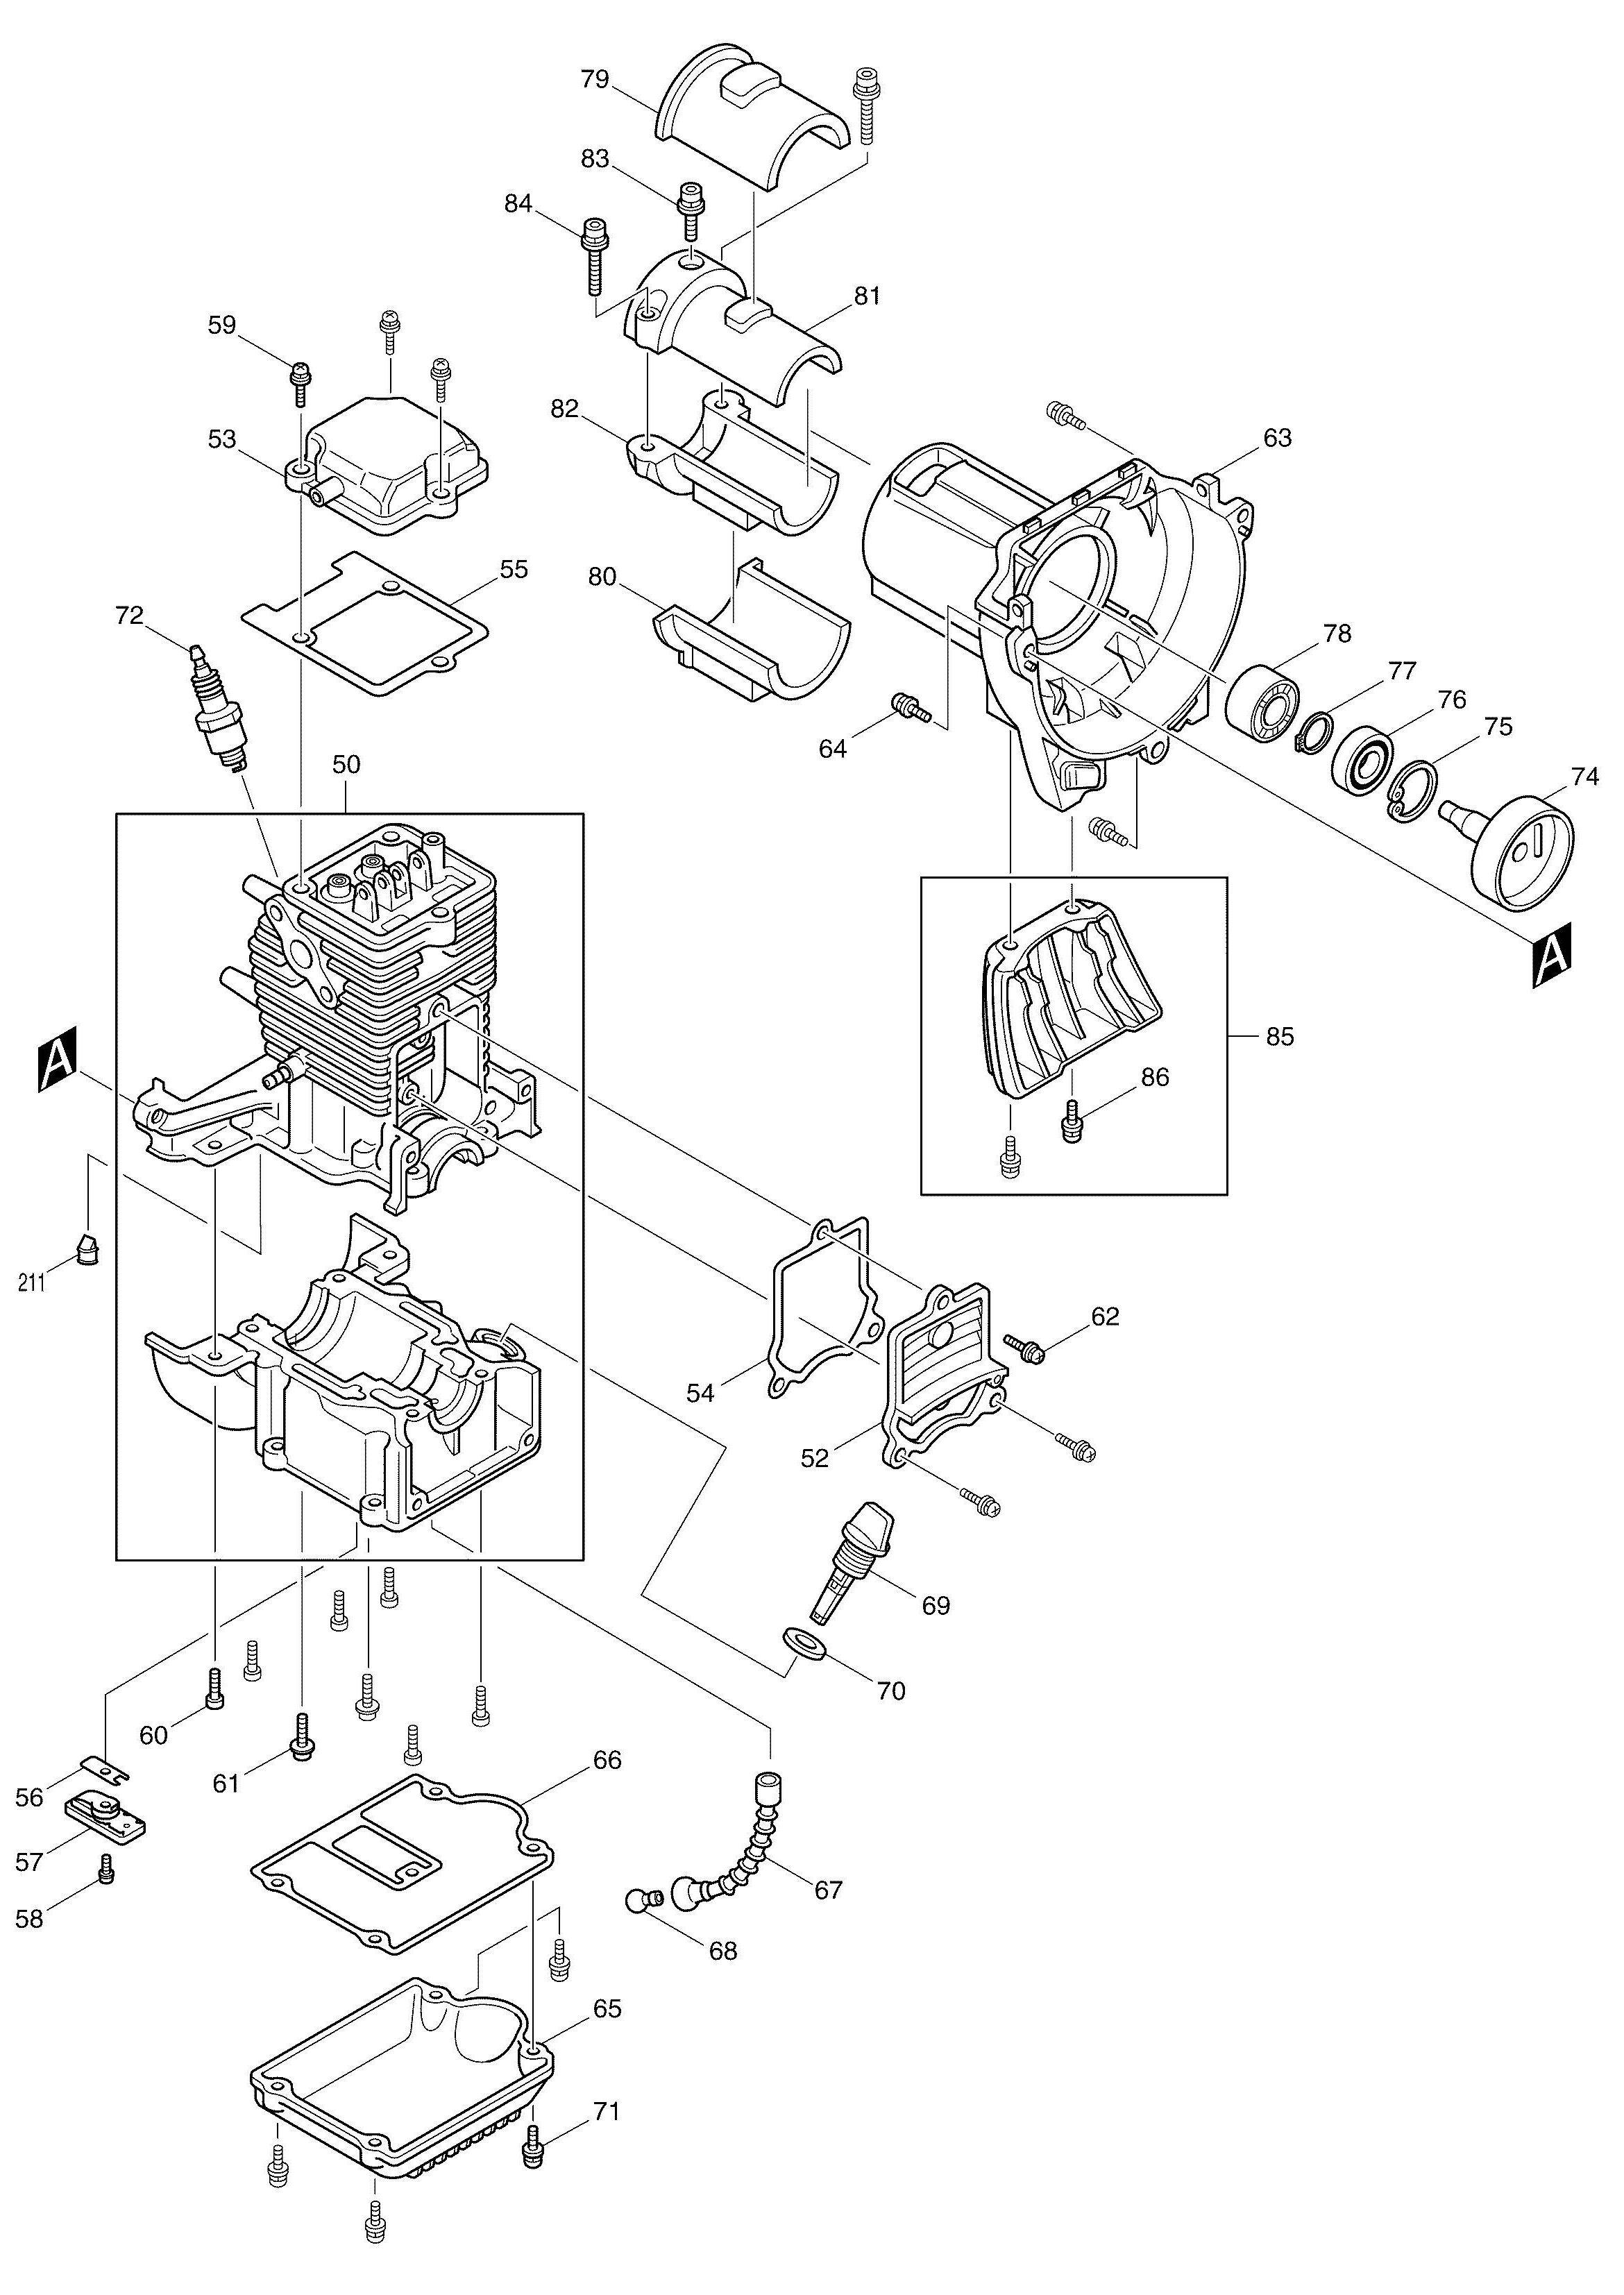 Spares for Makita Bcx2500 4 Stroke Brushcutter SPARE